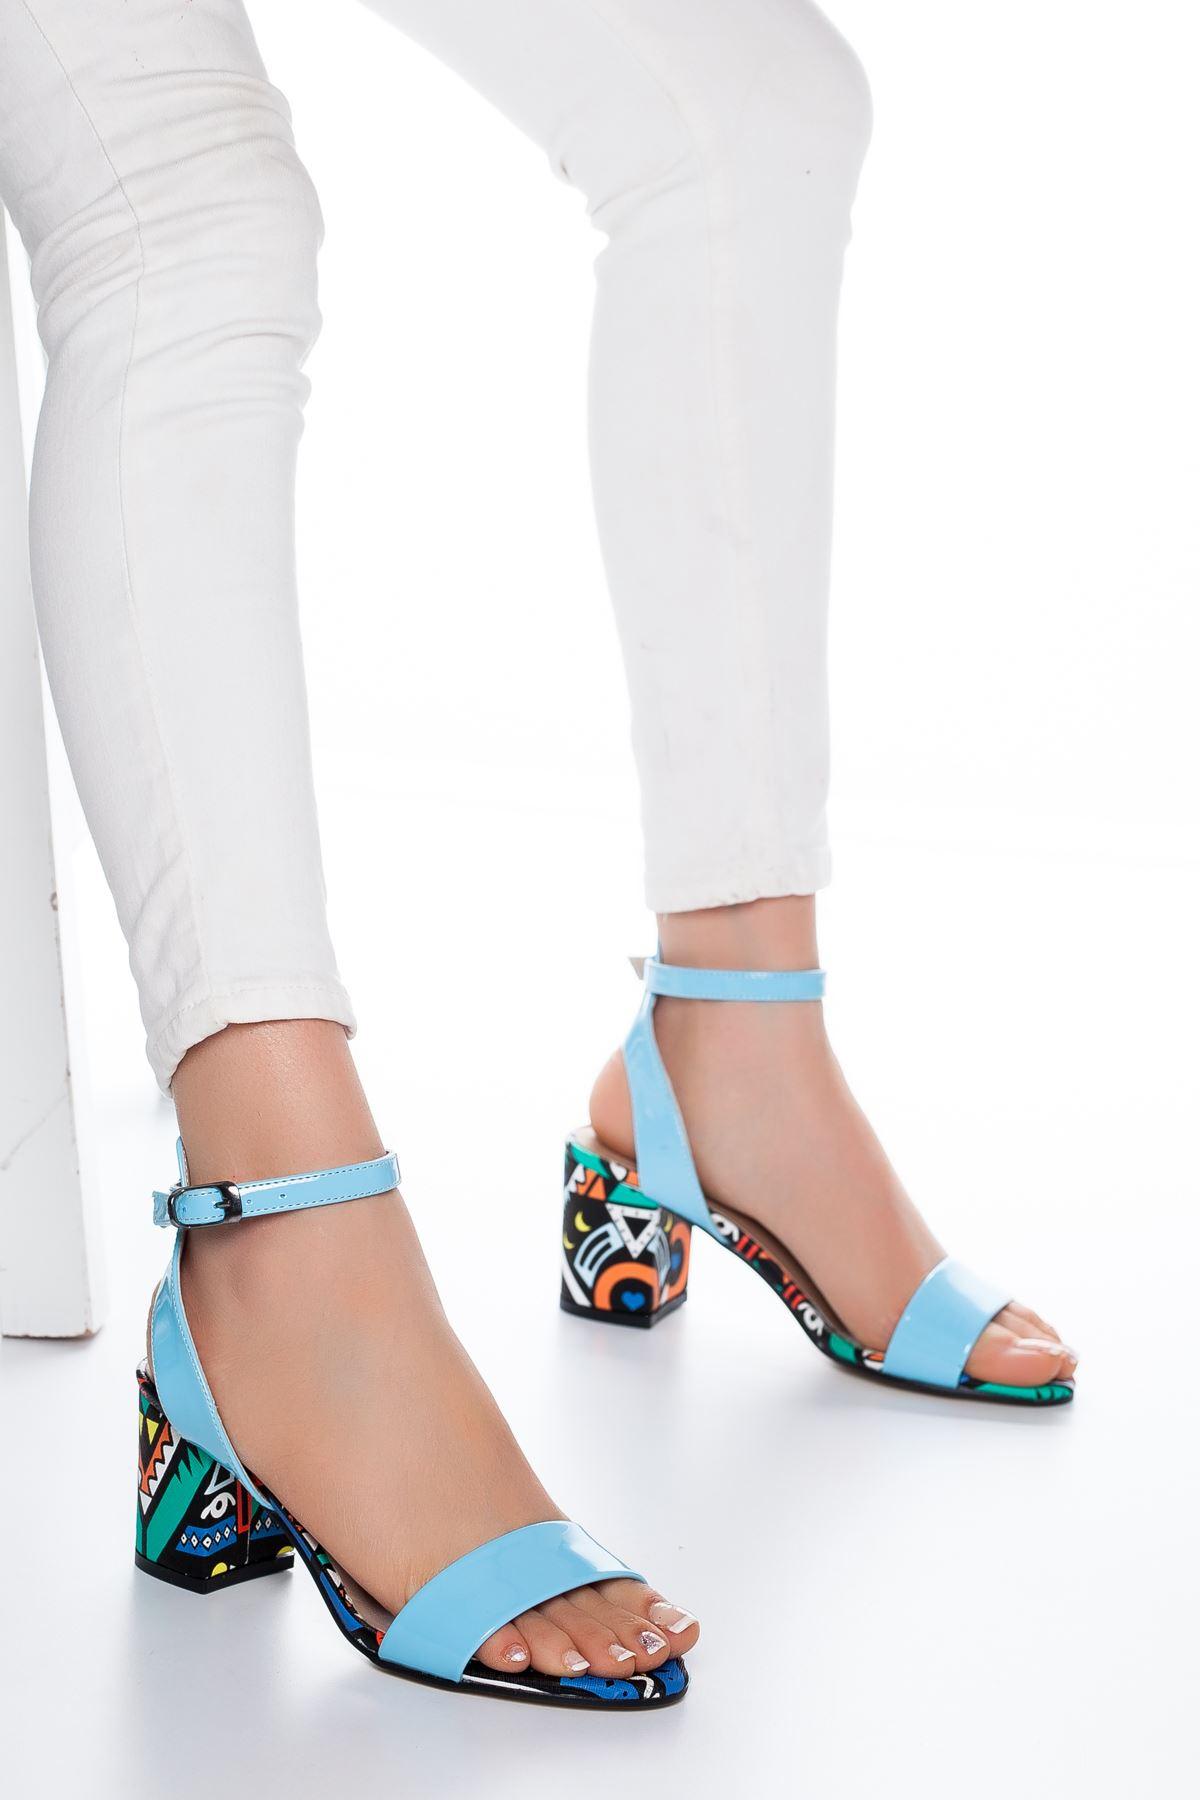 Panama Rugan Topuklu Ayakkabı Bebe Mavisi